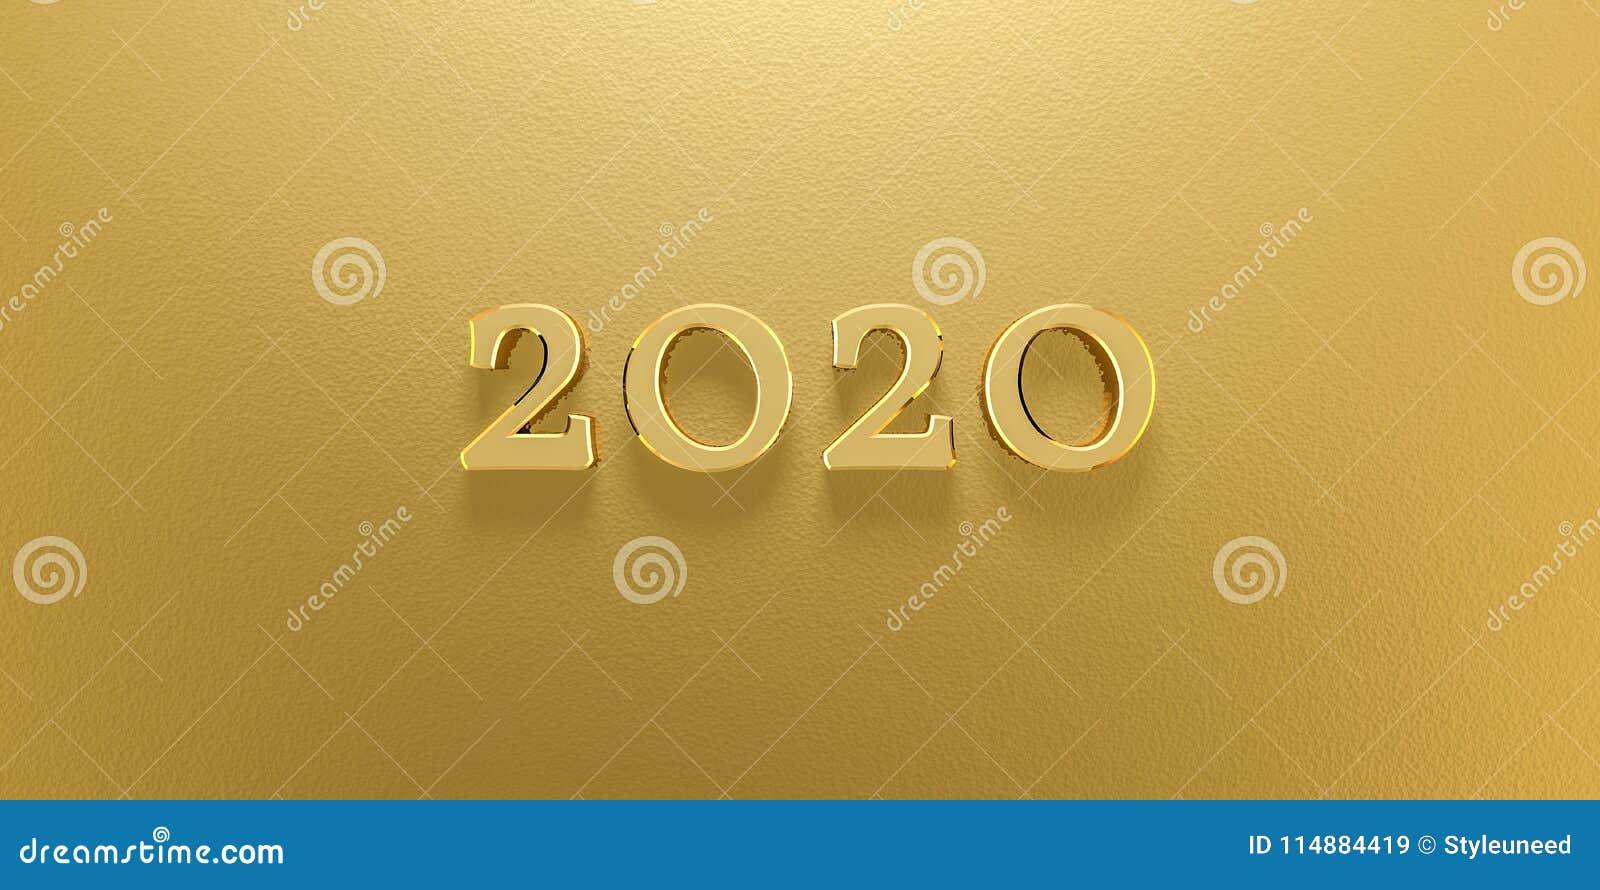 3d Illustration 2020 Gold Text Stock Illustration